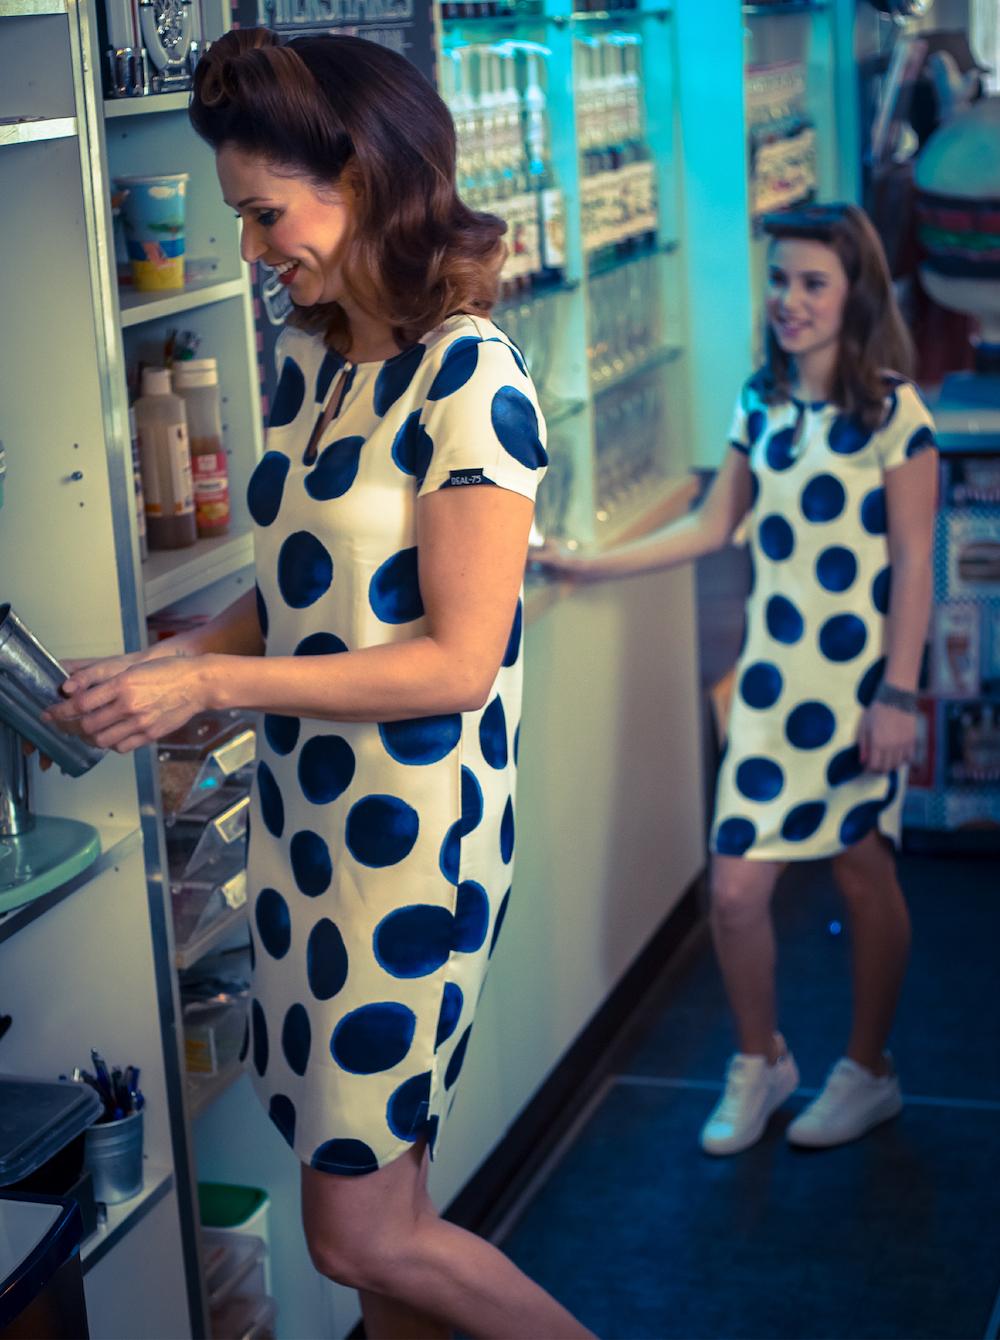 Ropa para madre e hija, vestidos de Deal-75 para verano